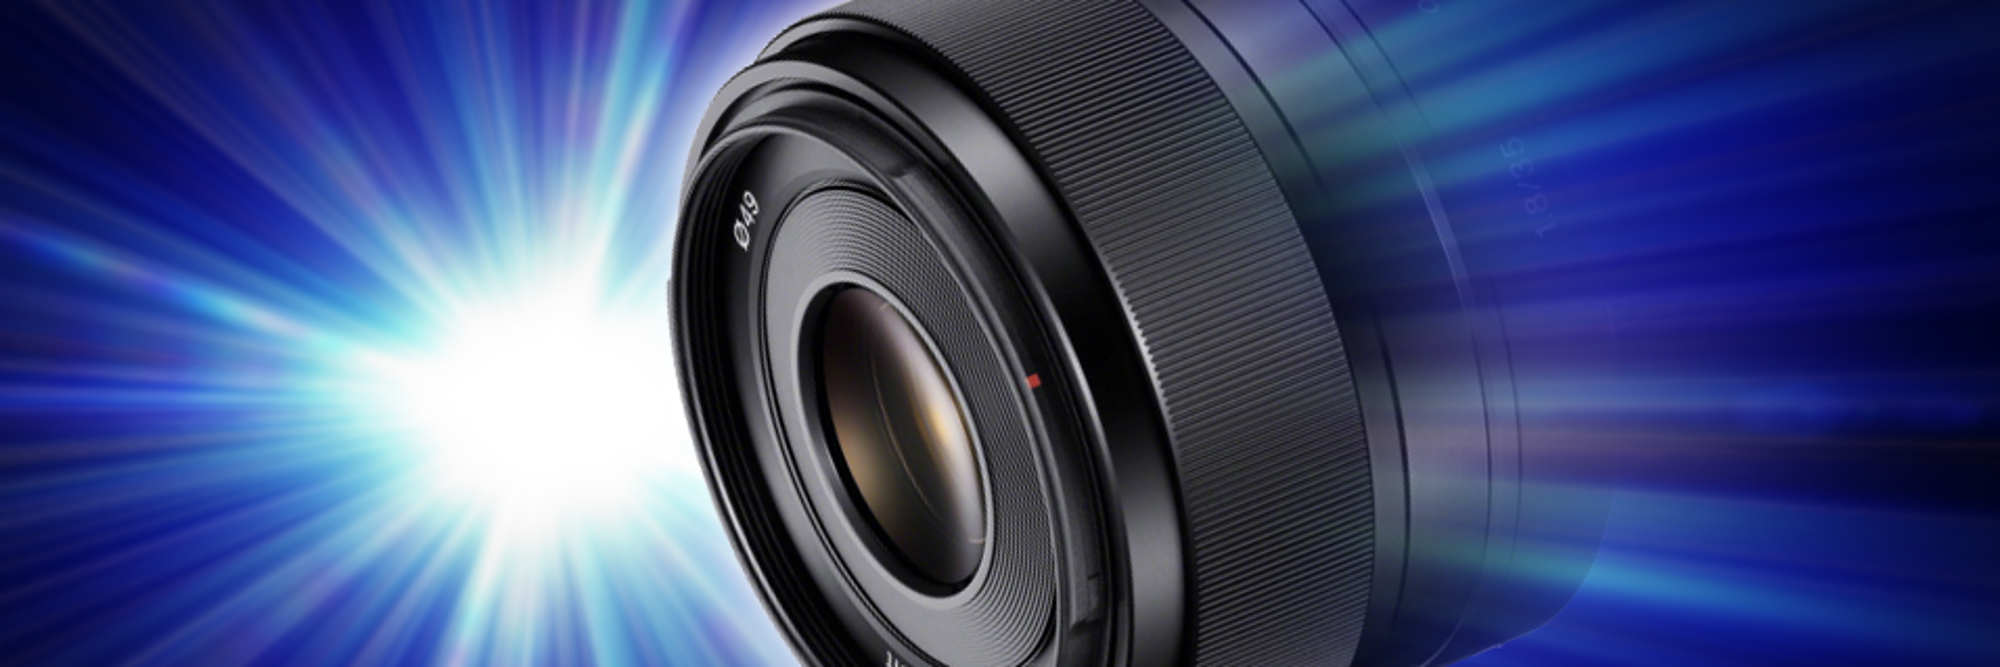 Sony tar patent på nye objektiver